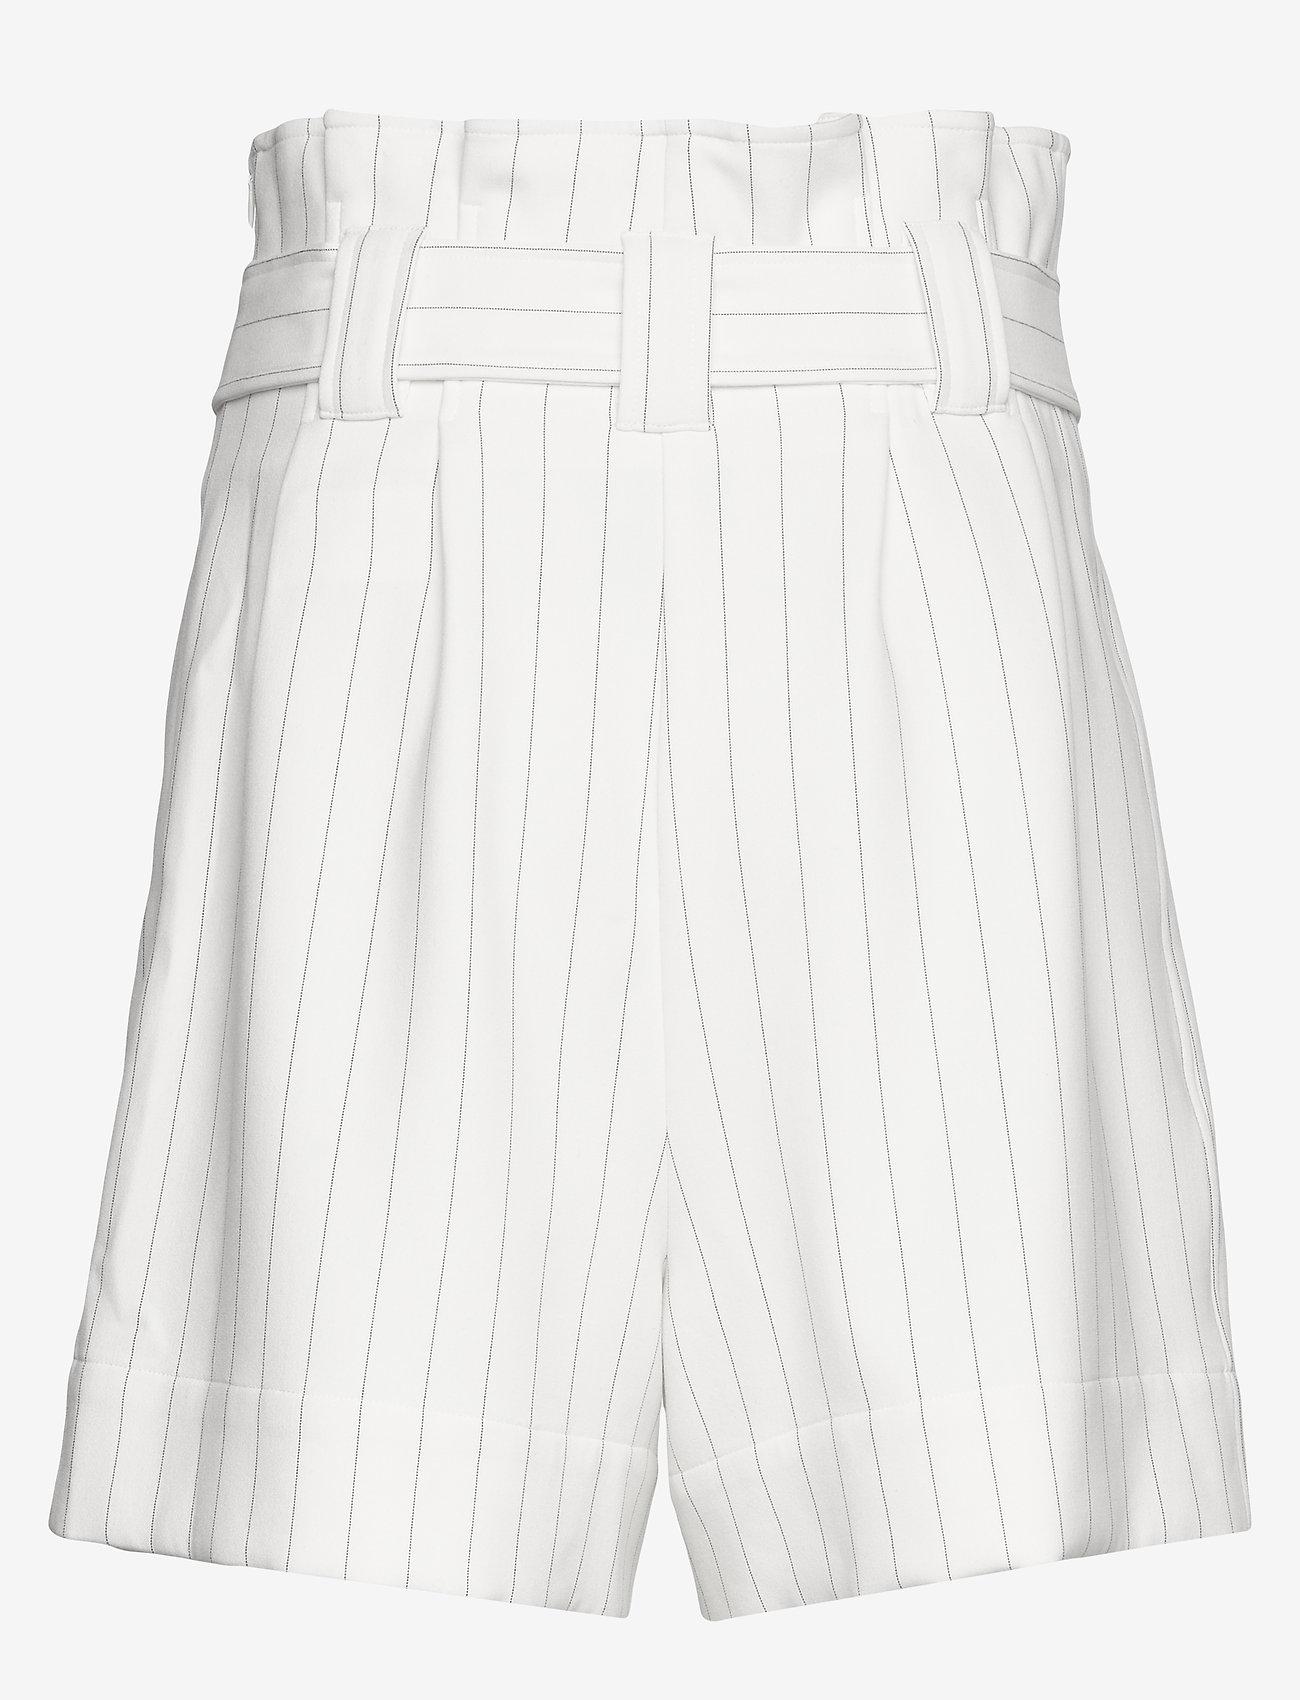 Ganni - Suiting - paper bag shorts - egret - 1